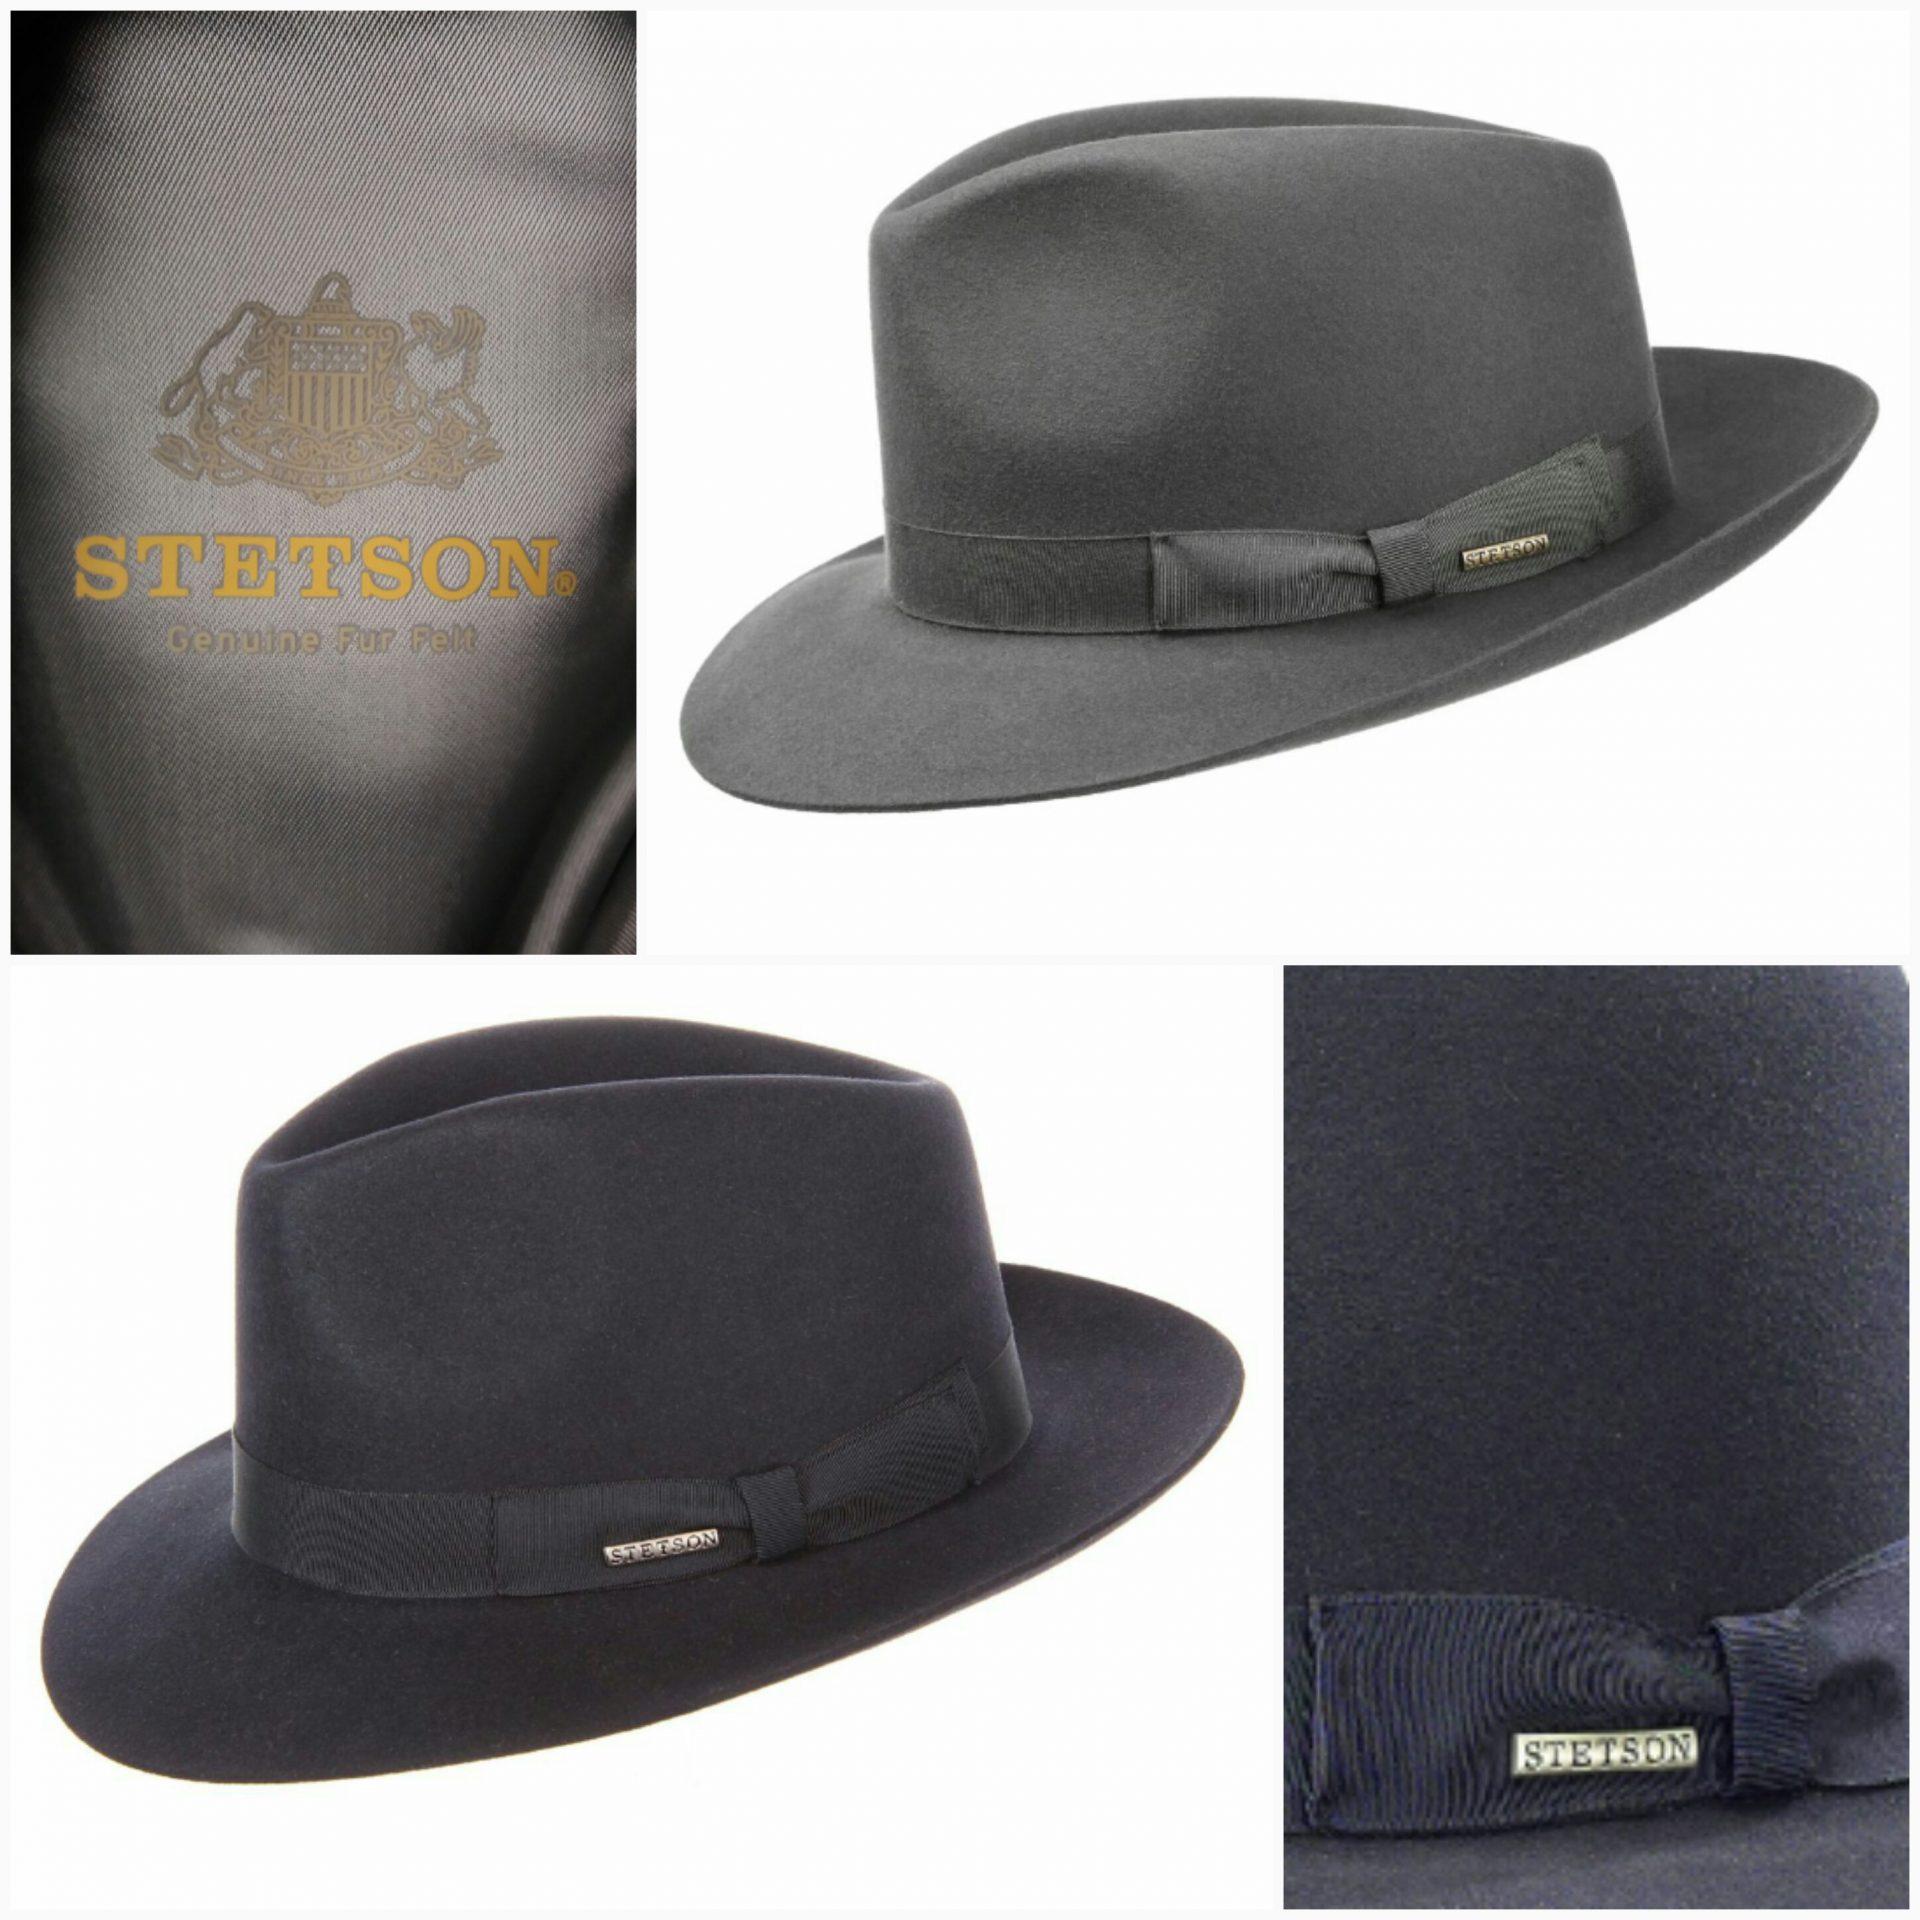 6ab0ae110 Stetson Penn Bogart fedora hat 129,- – H. Witting and Son